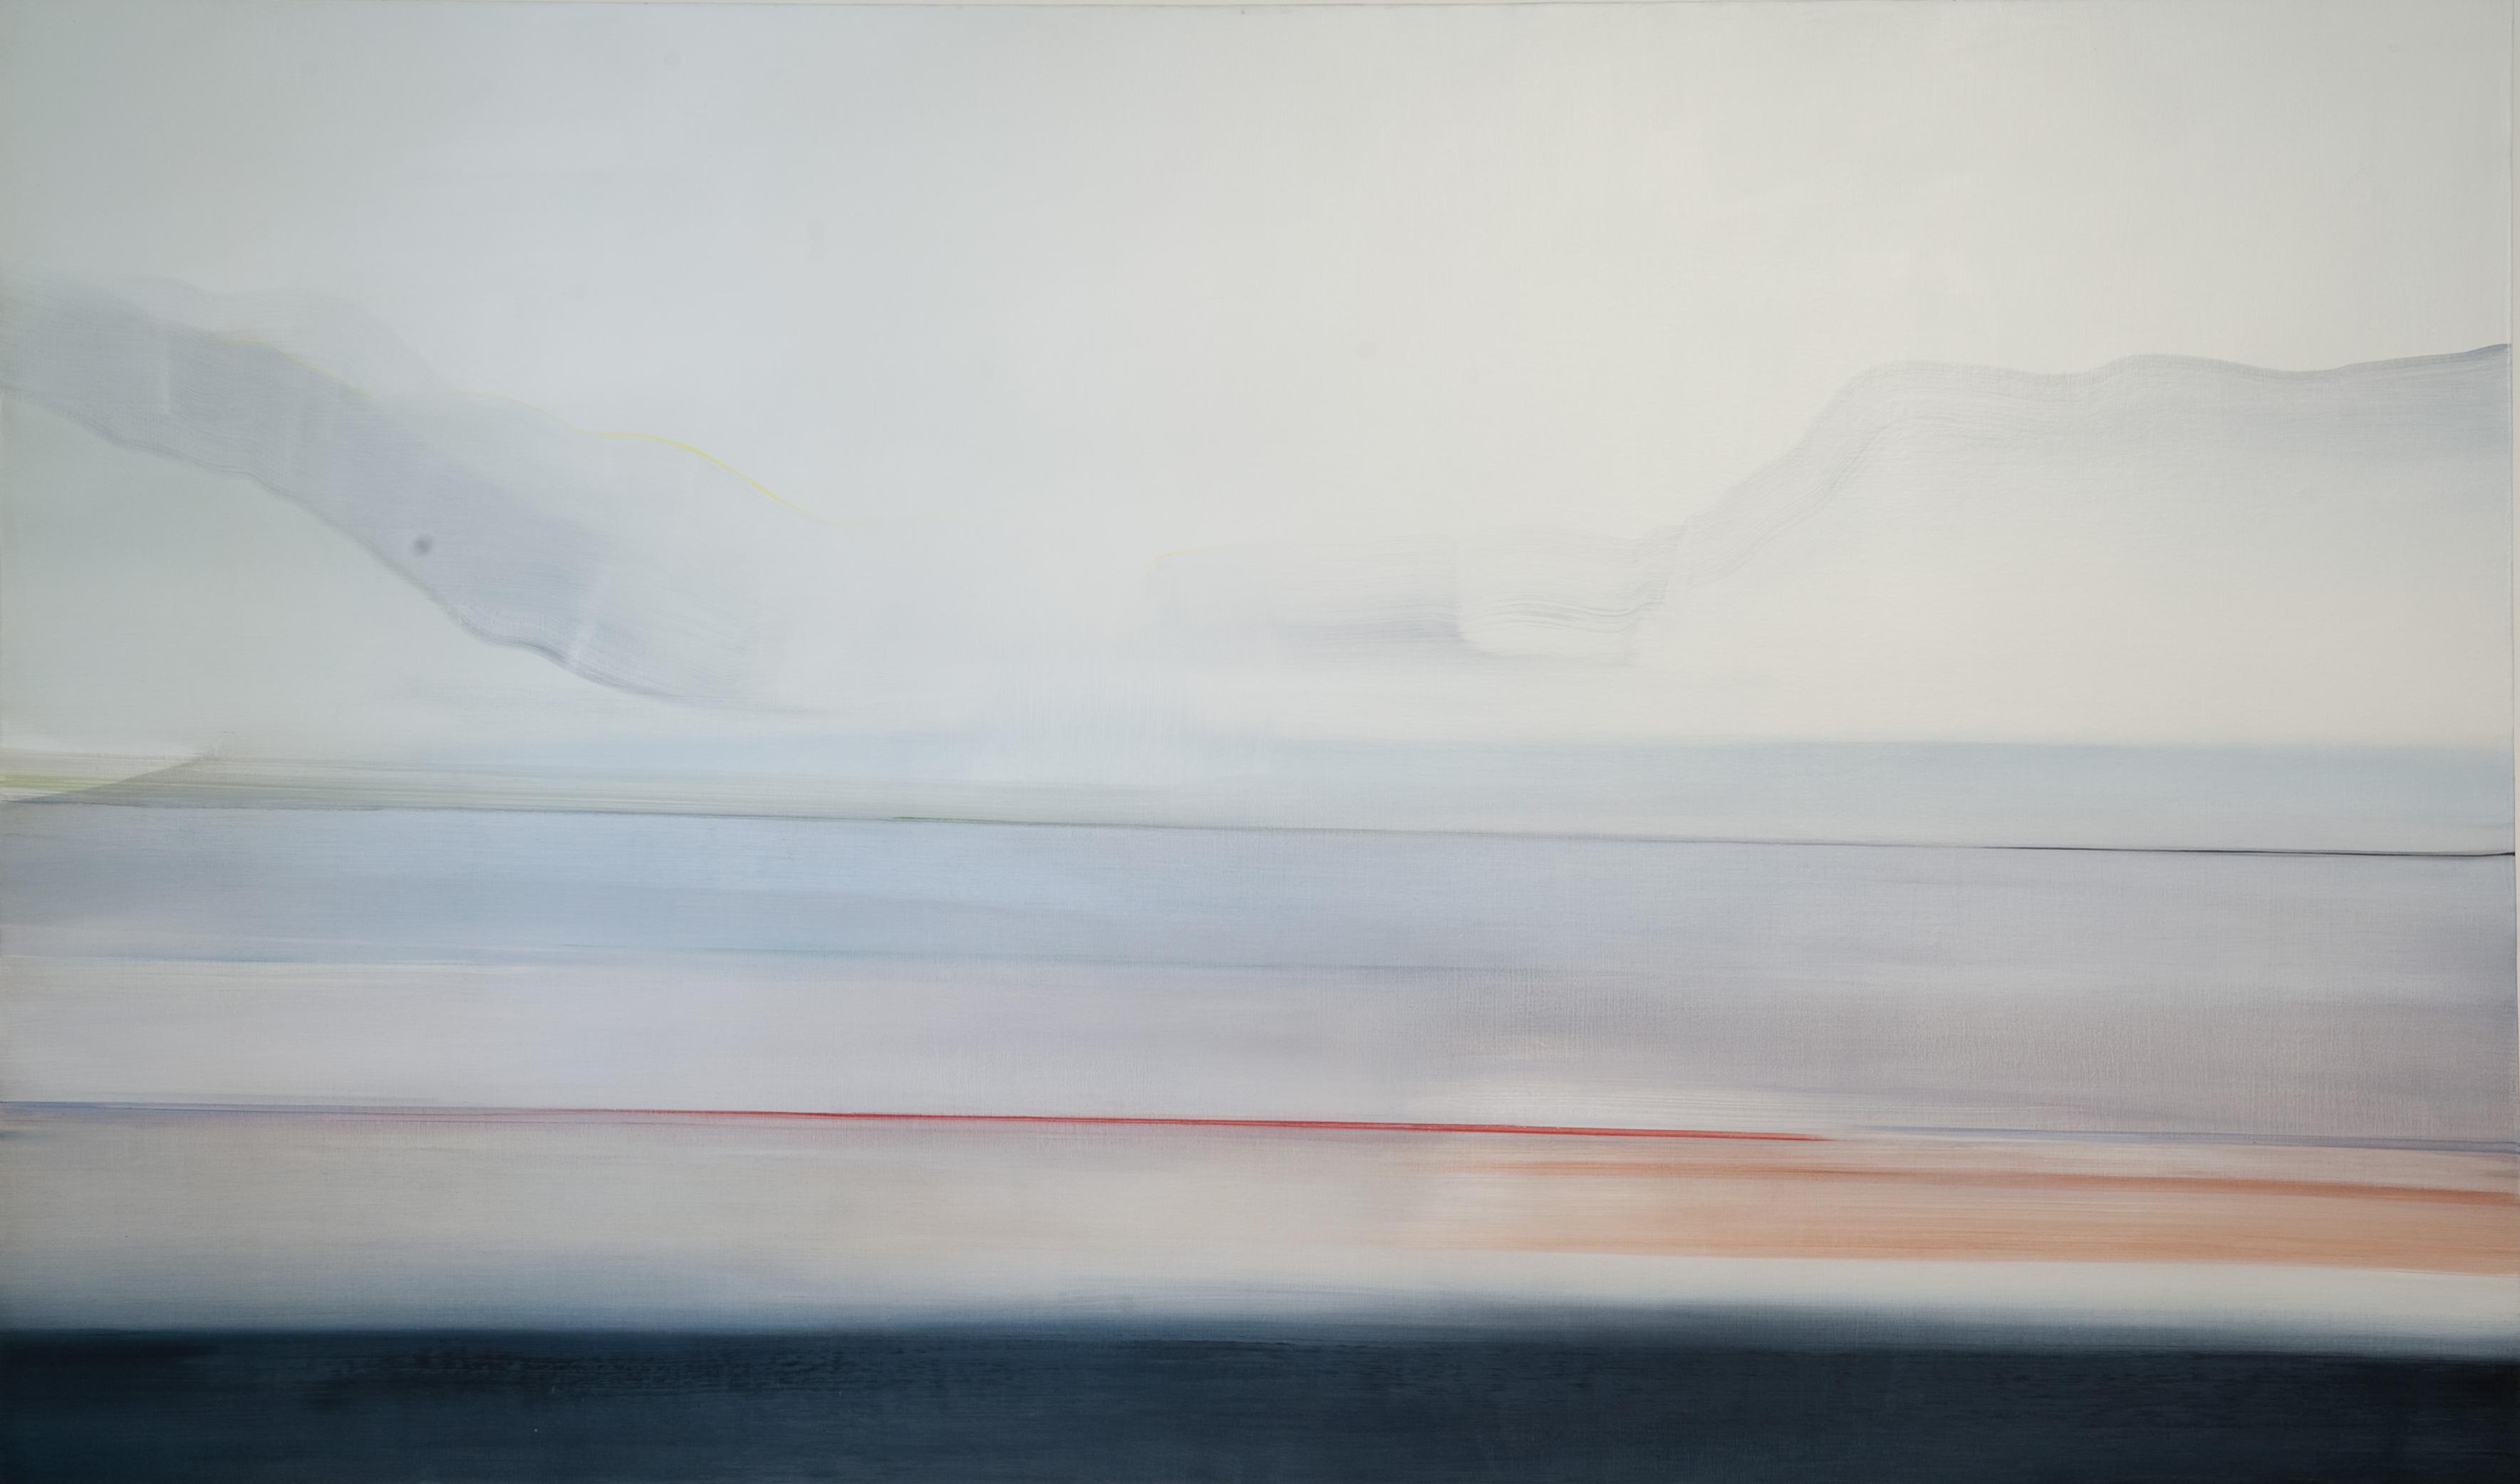 Riikka Ahlfors art painting taide maalaus Baikal, 185 cm x 110 cm, oil on canvas, 2012